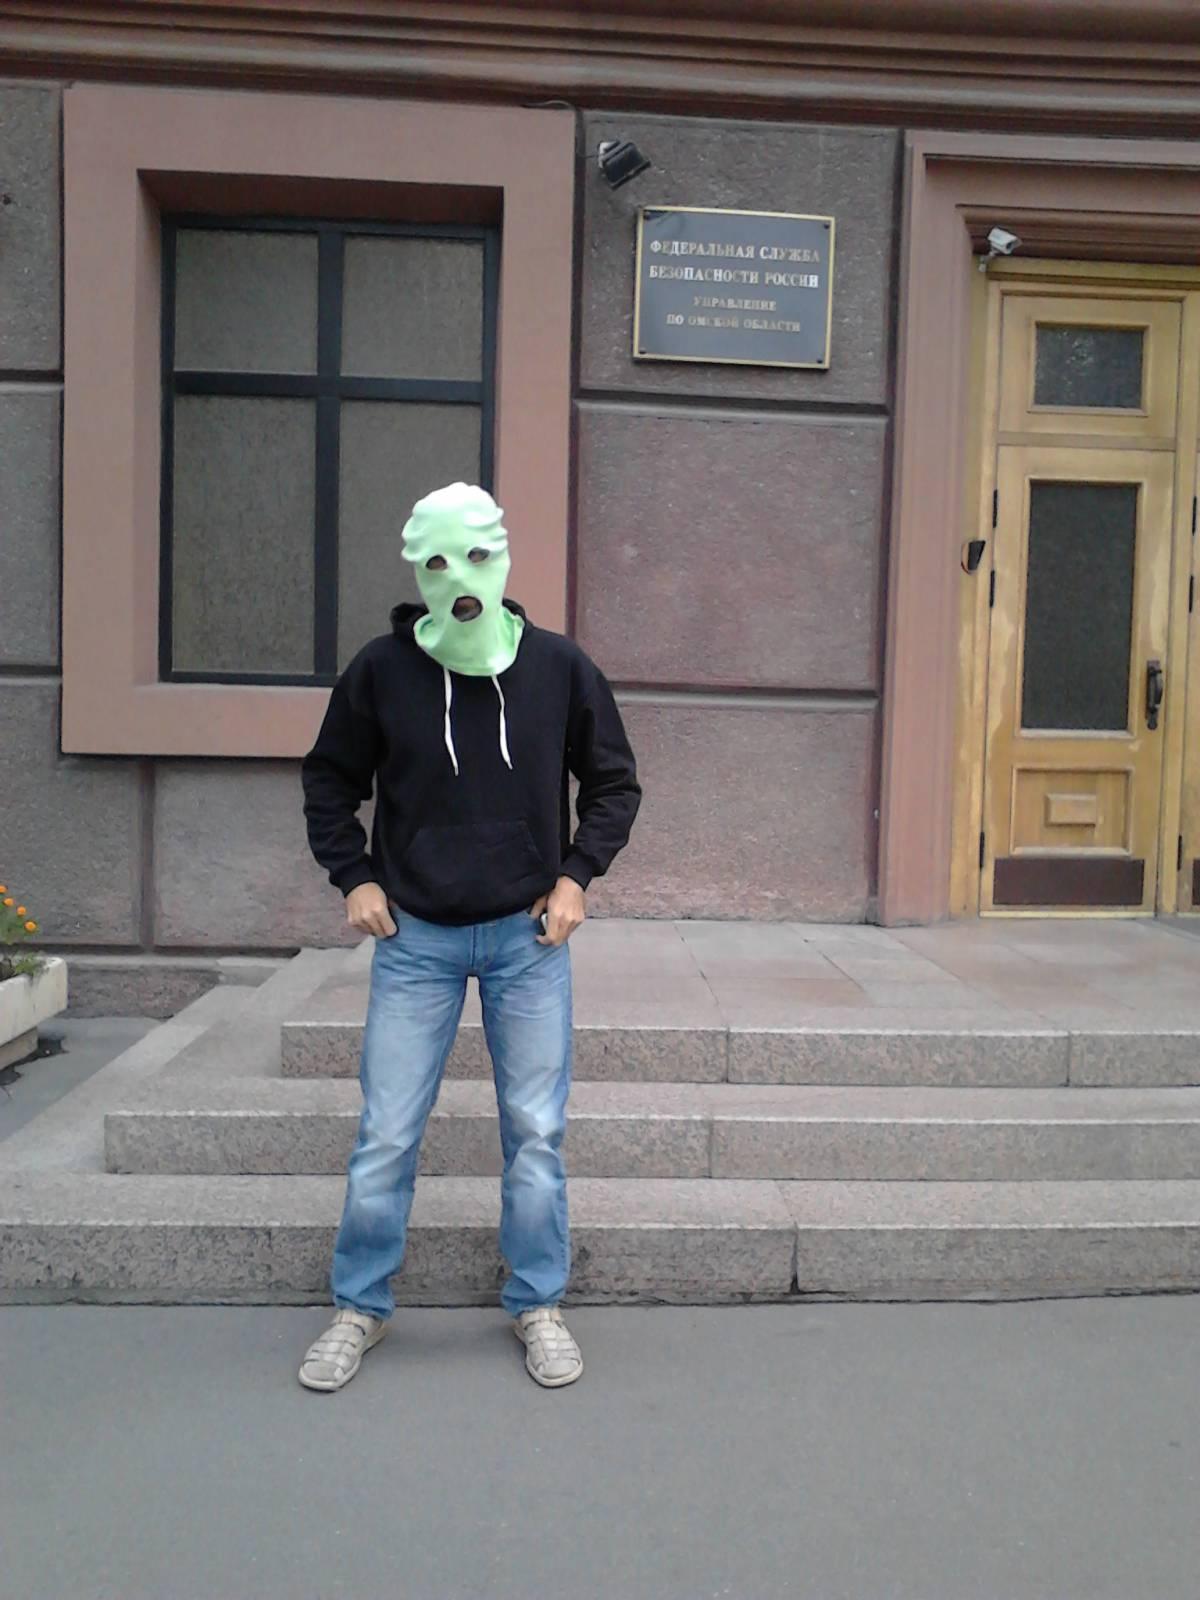 Виктор Корб в балаклаве на фоне вывески УФСБ по Омской области